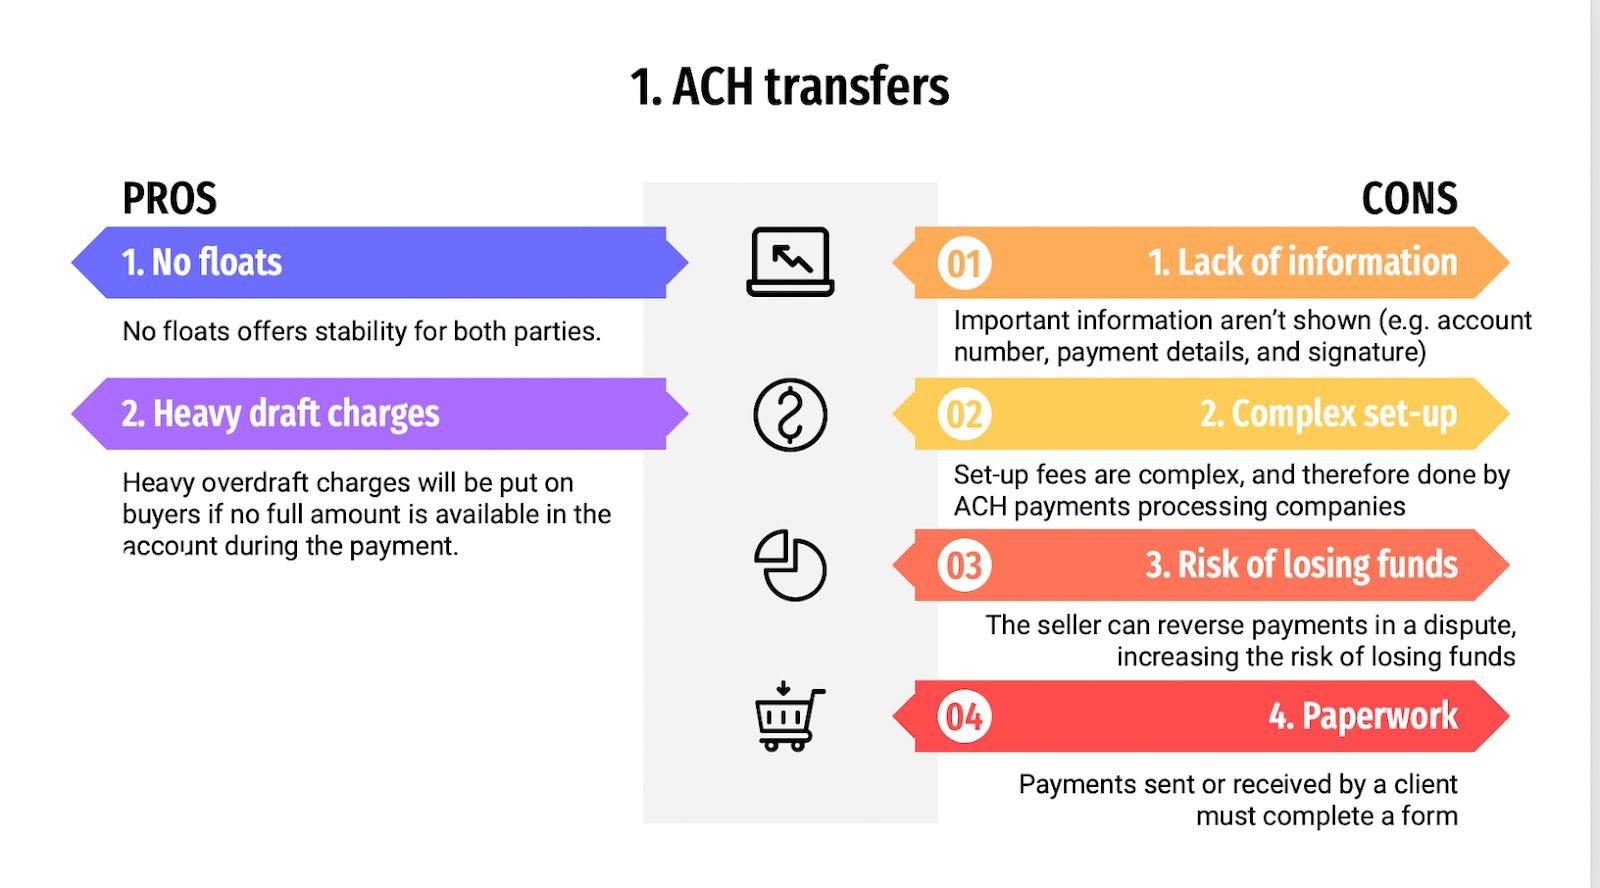 ACH transfers